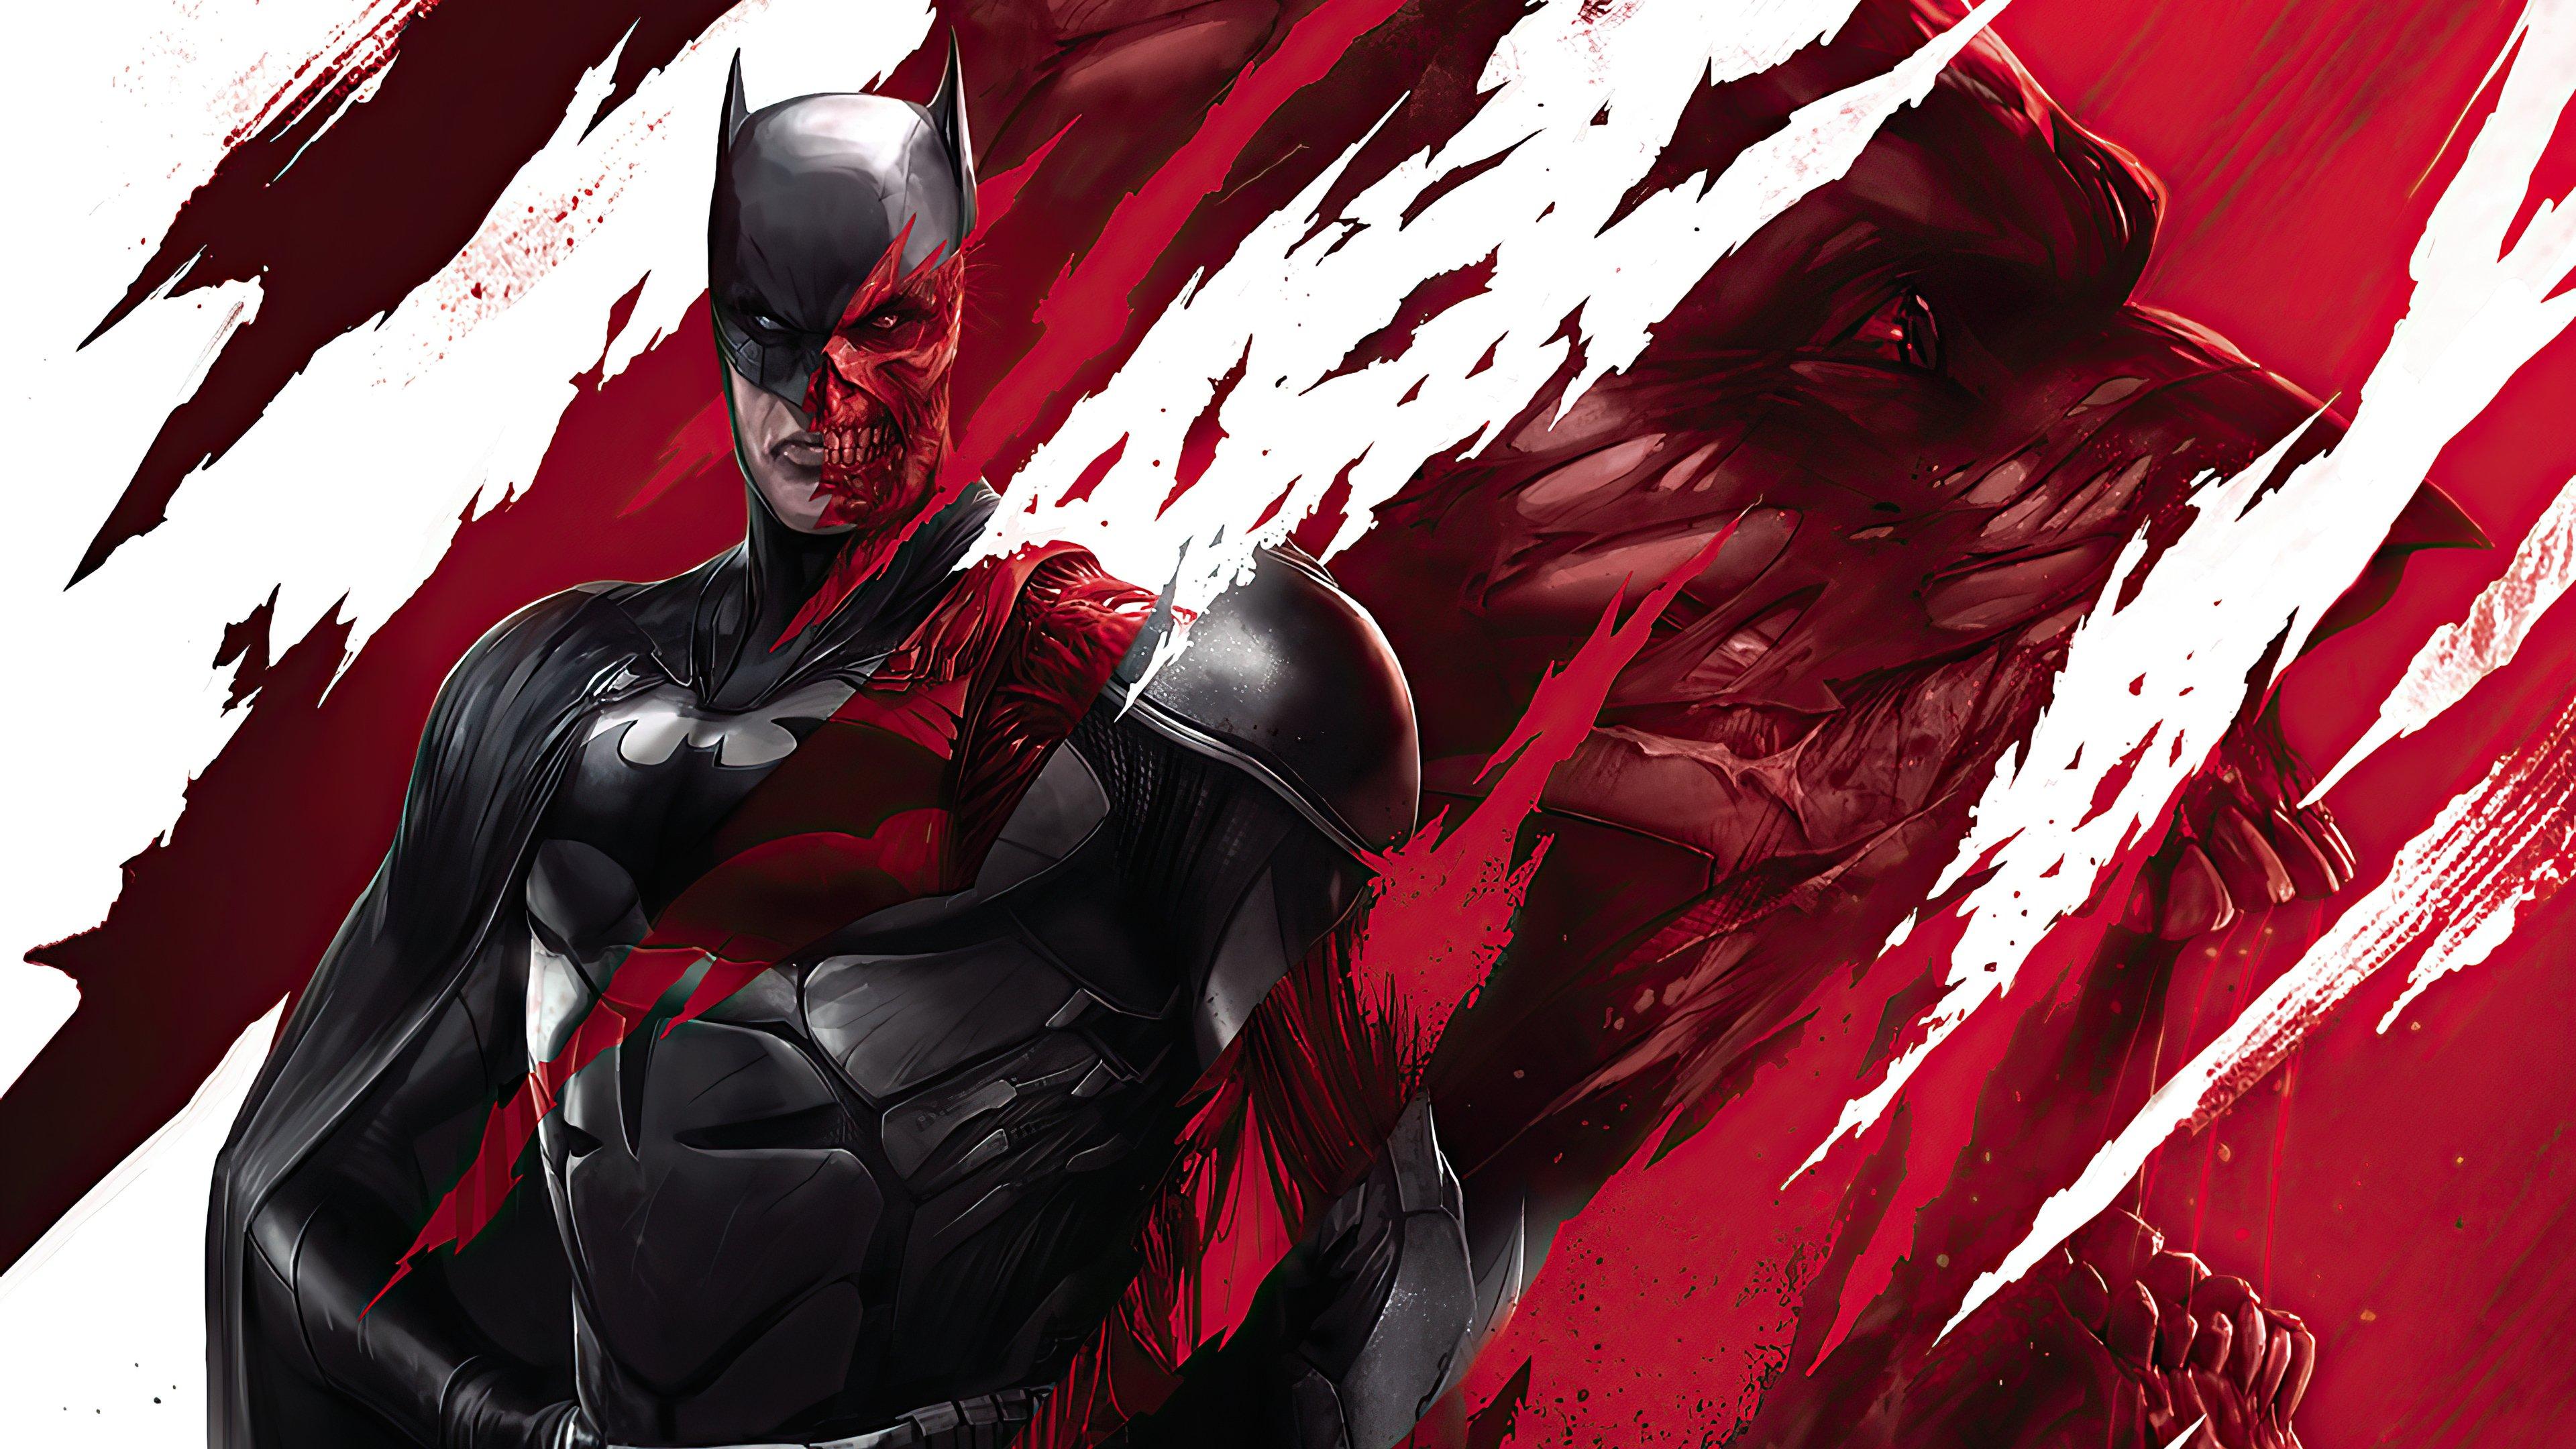 Wallpaper Batman Fanart